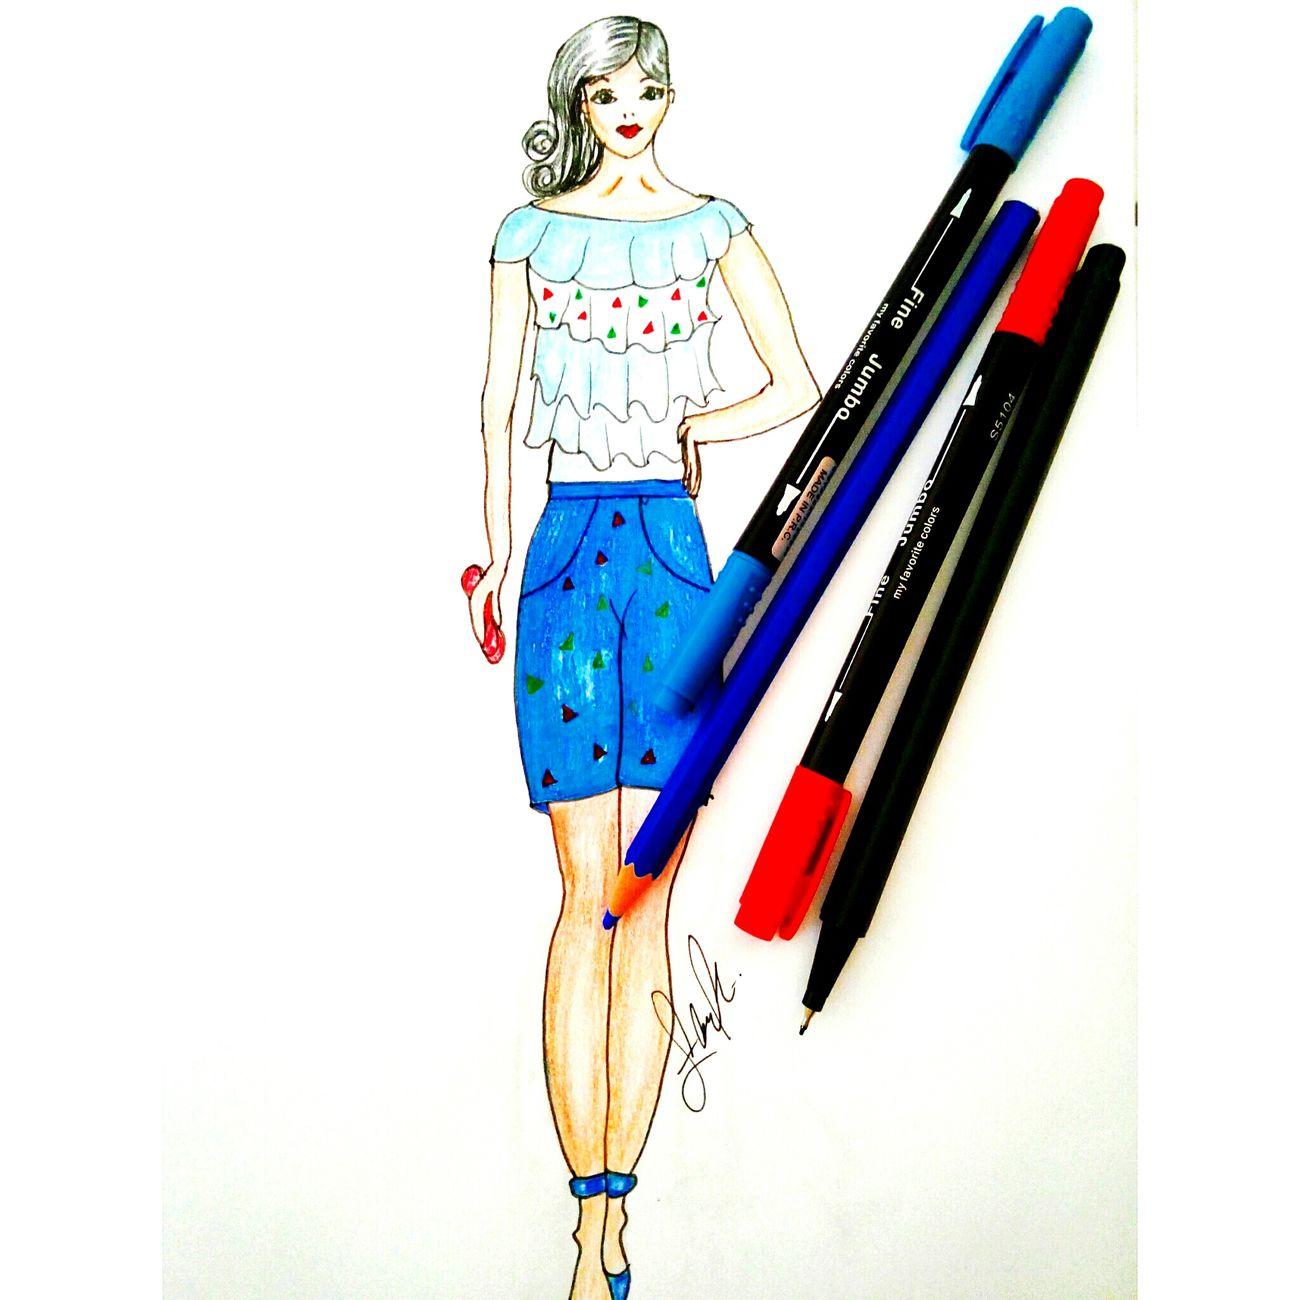 Moda Modaetica Modatasarımı Fashion Fashion&love&beauty Fashiondesign Fashiondesignerlife FashionDesigner Fashiondesigner Sketch